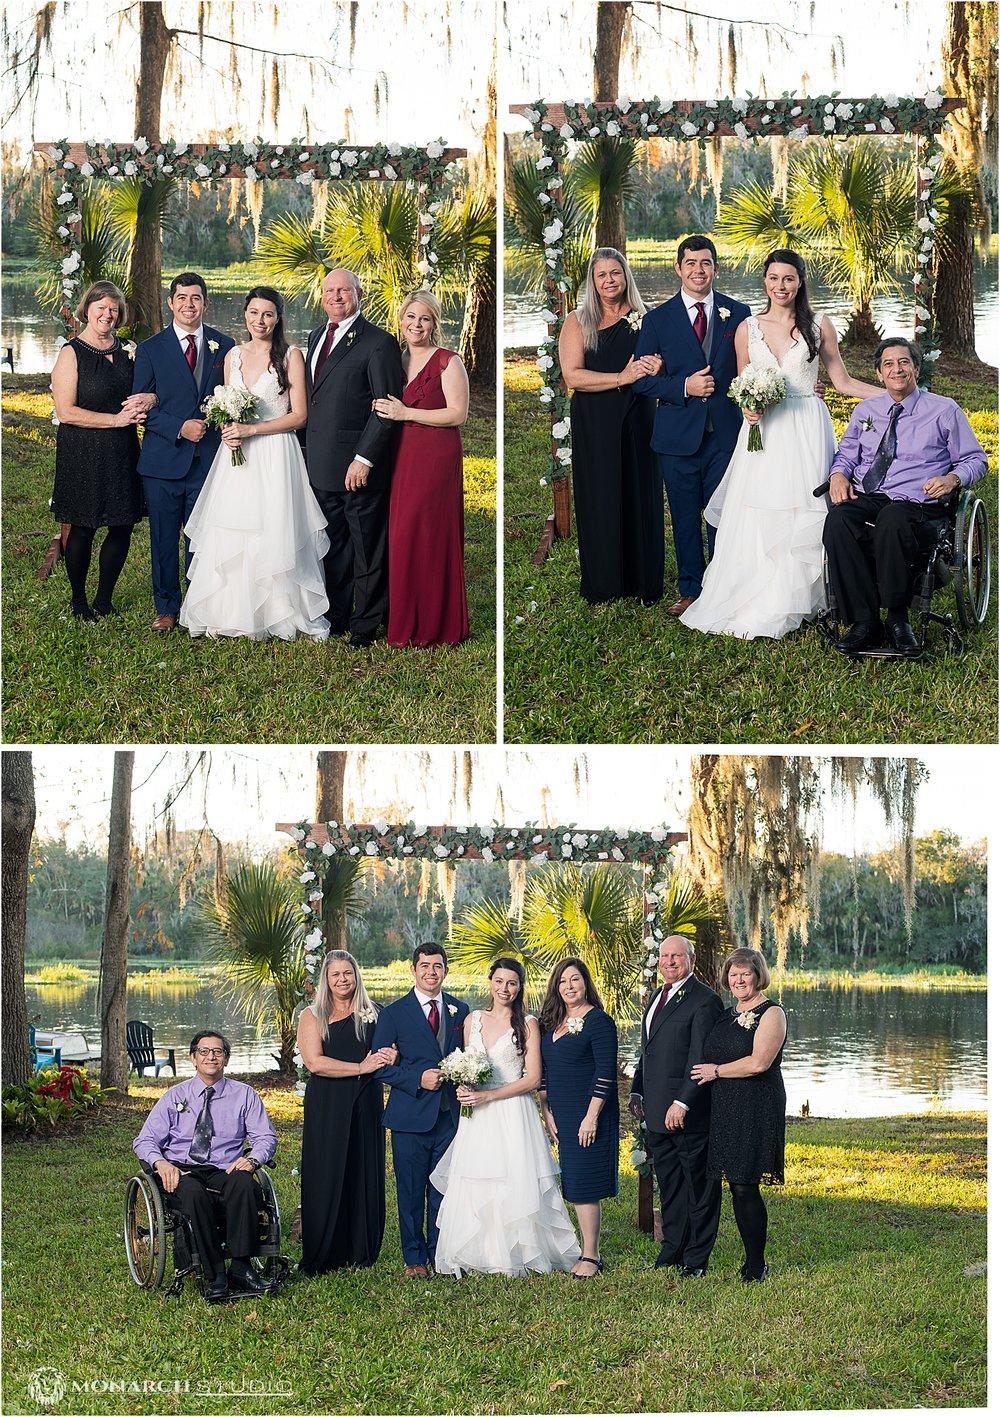 Wedding-photographer-in-sanford-florida-natural-wedding-071.jpg